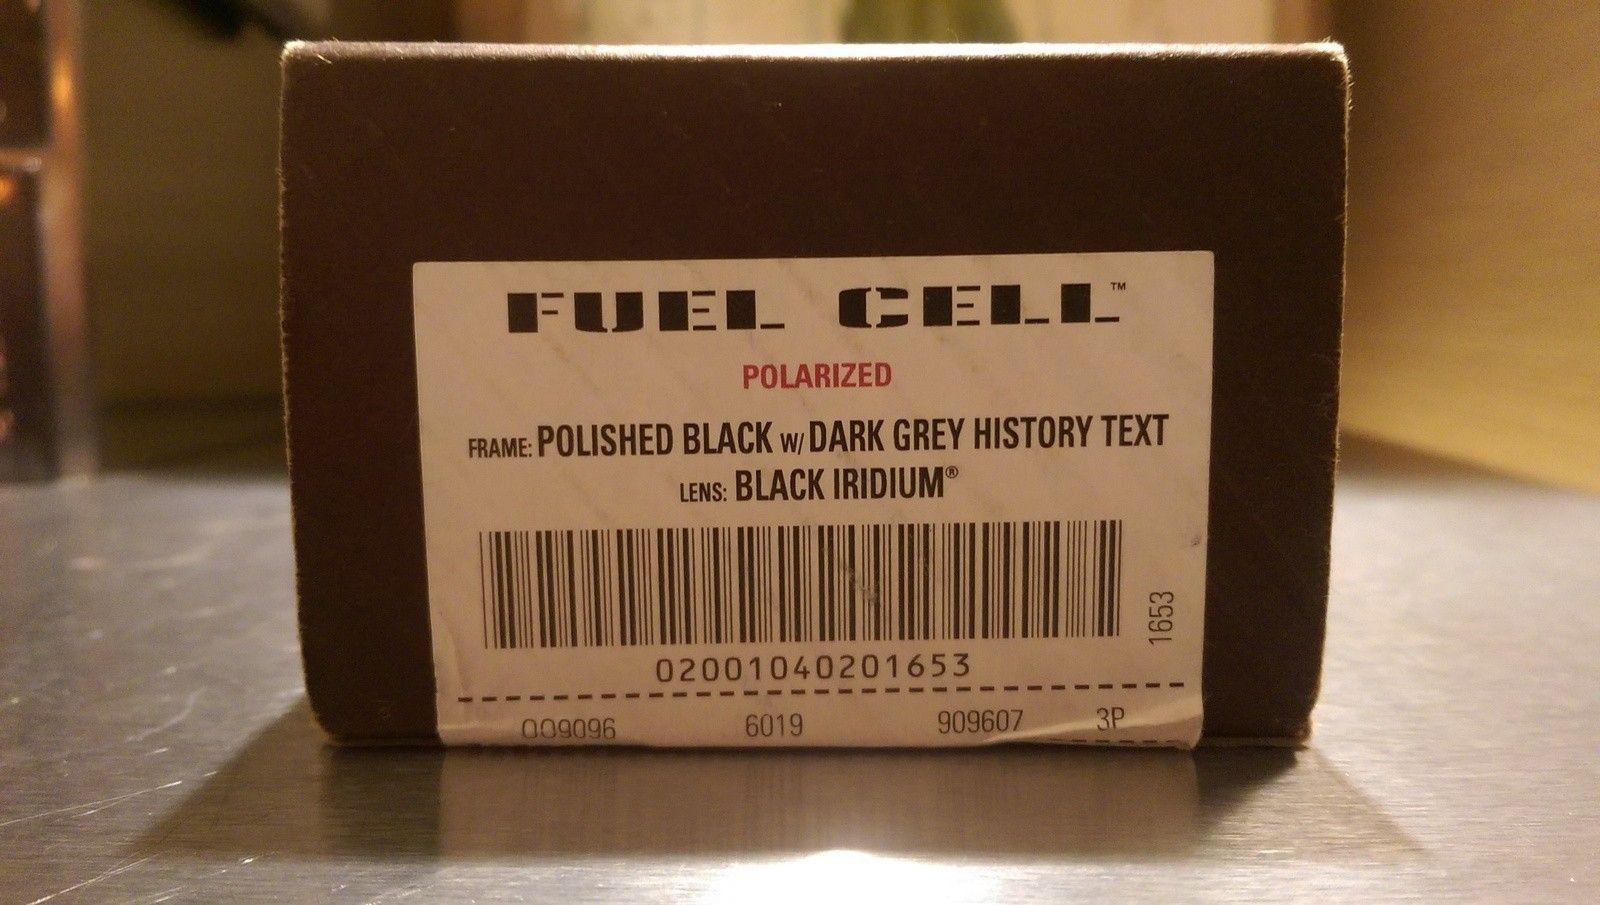 Oakley Fuel Cell Polish Black /dark silver history/Black iridium polarized BNIB - IMAG4868.jpg